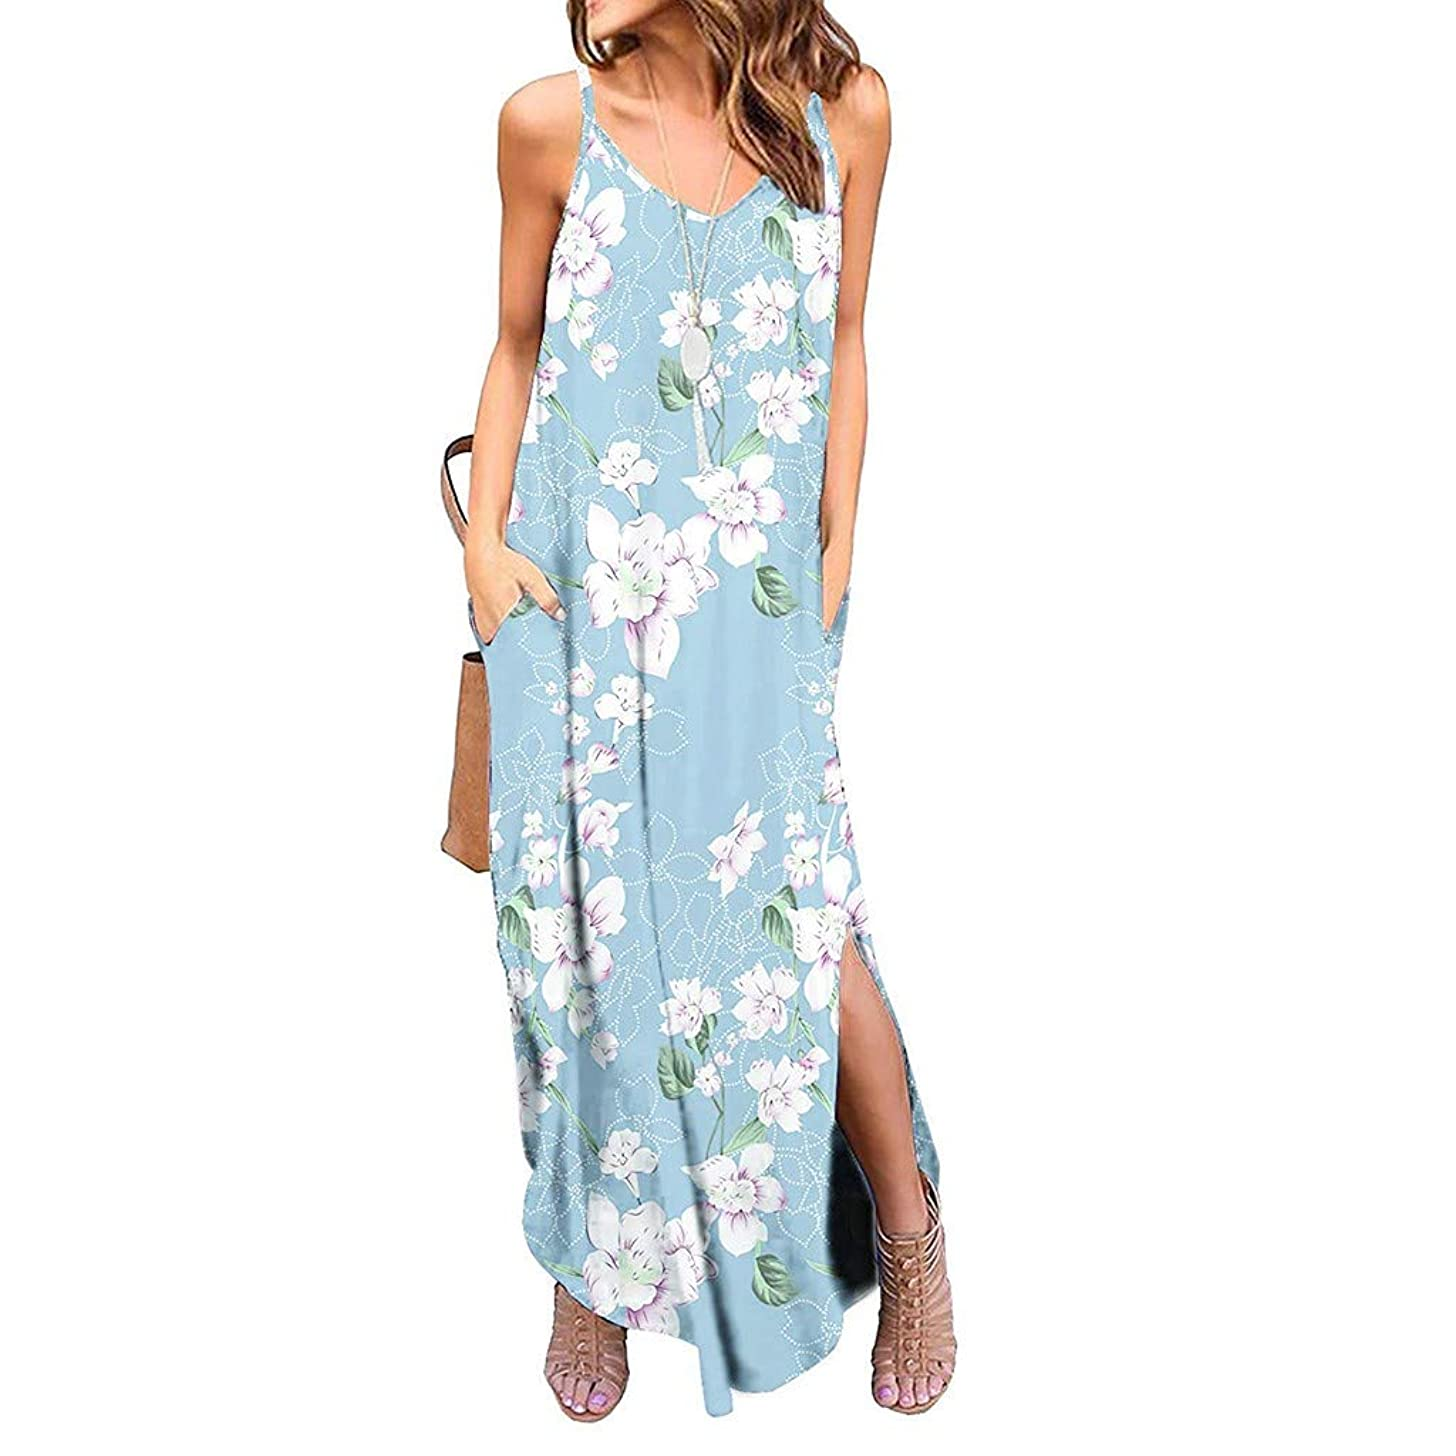 Hotkey Women's Dresses Women's Sleeveless Casual Floral Print Beach Long Maxi Loose Dress Pocket Plus Size